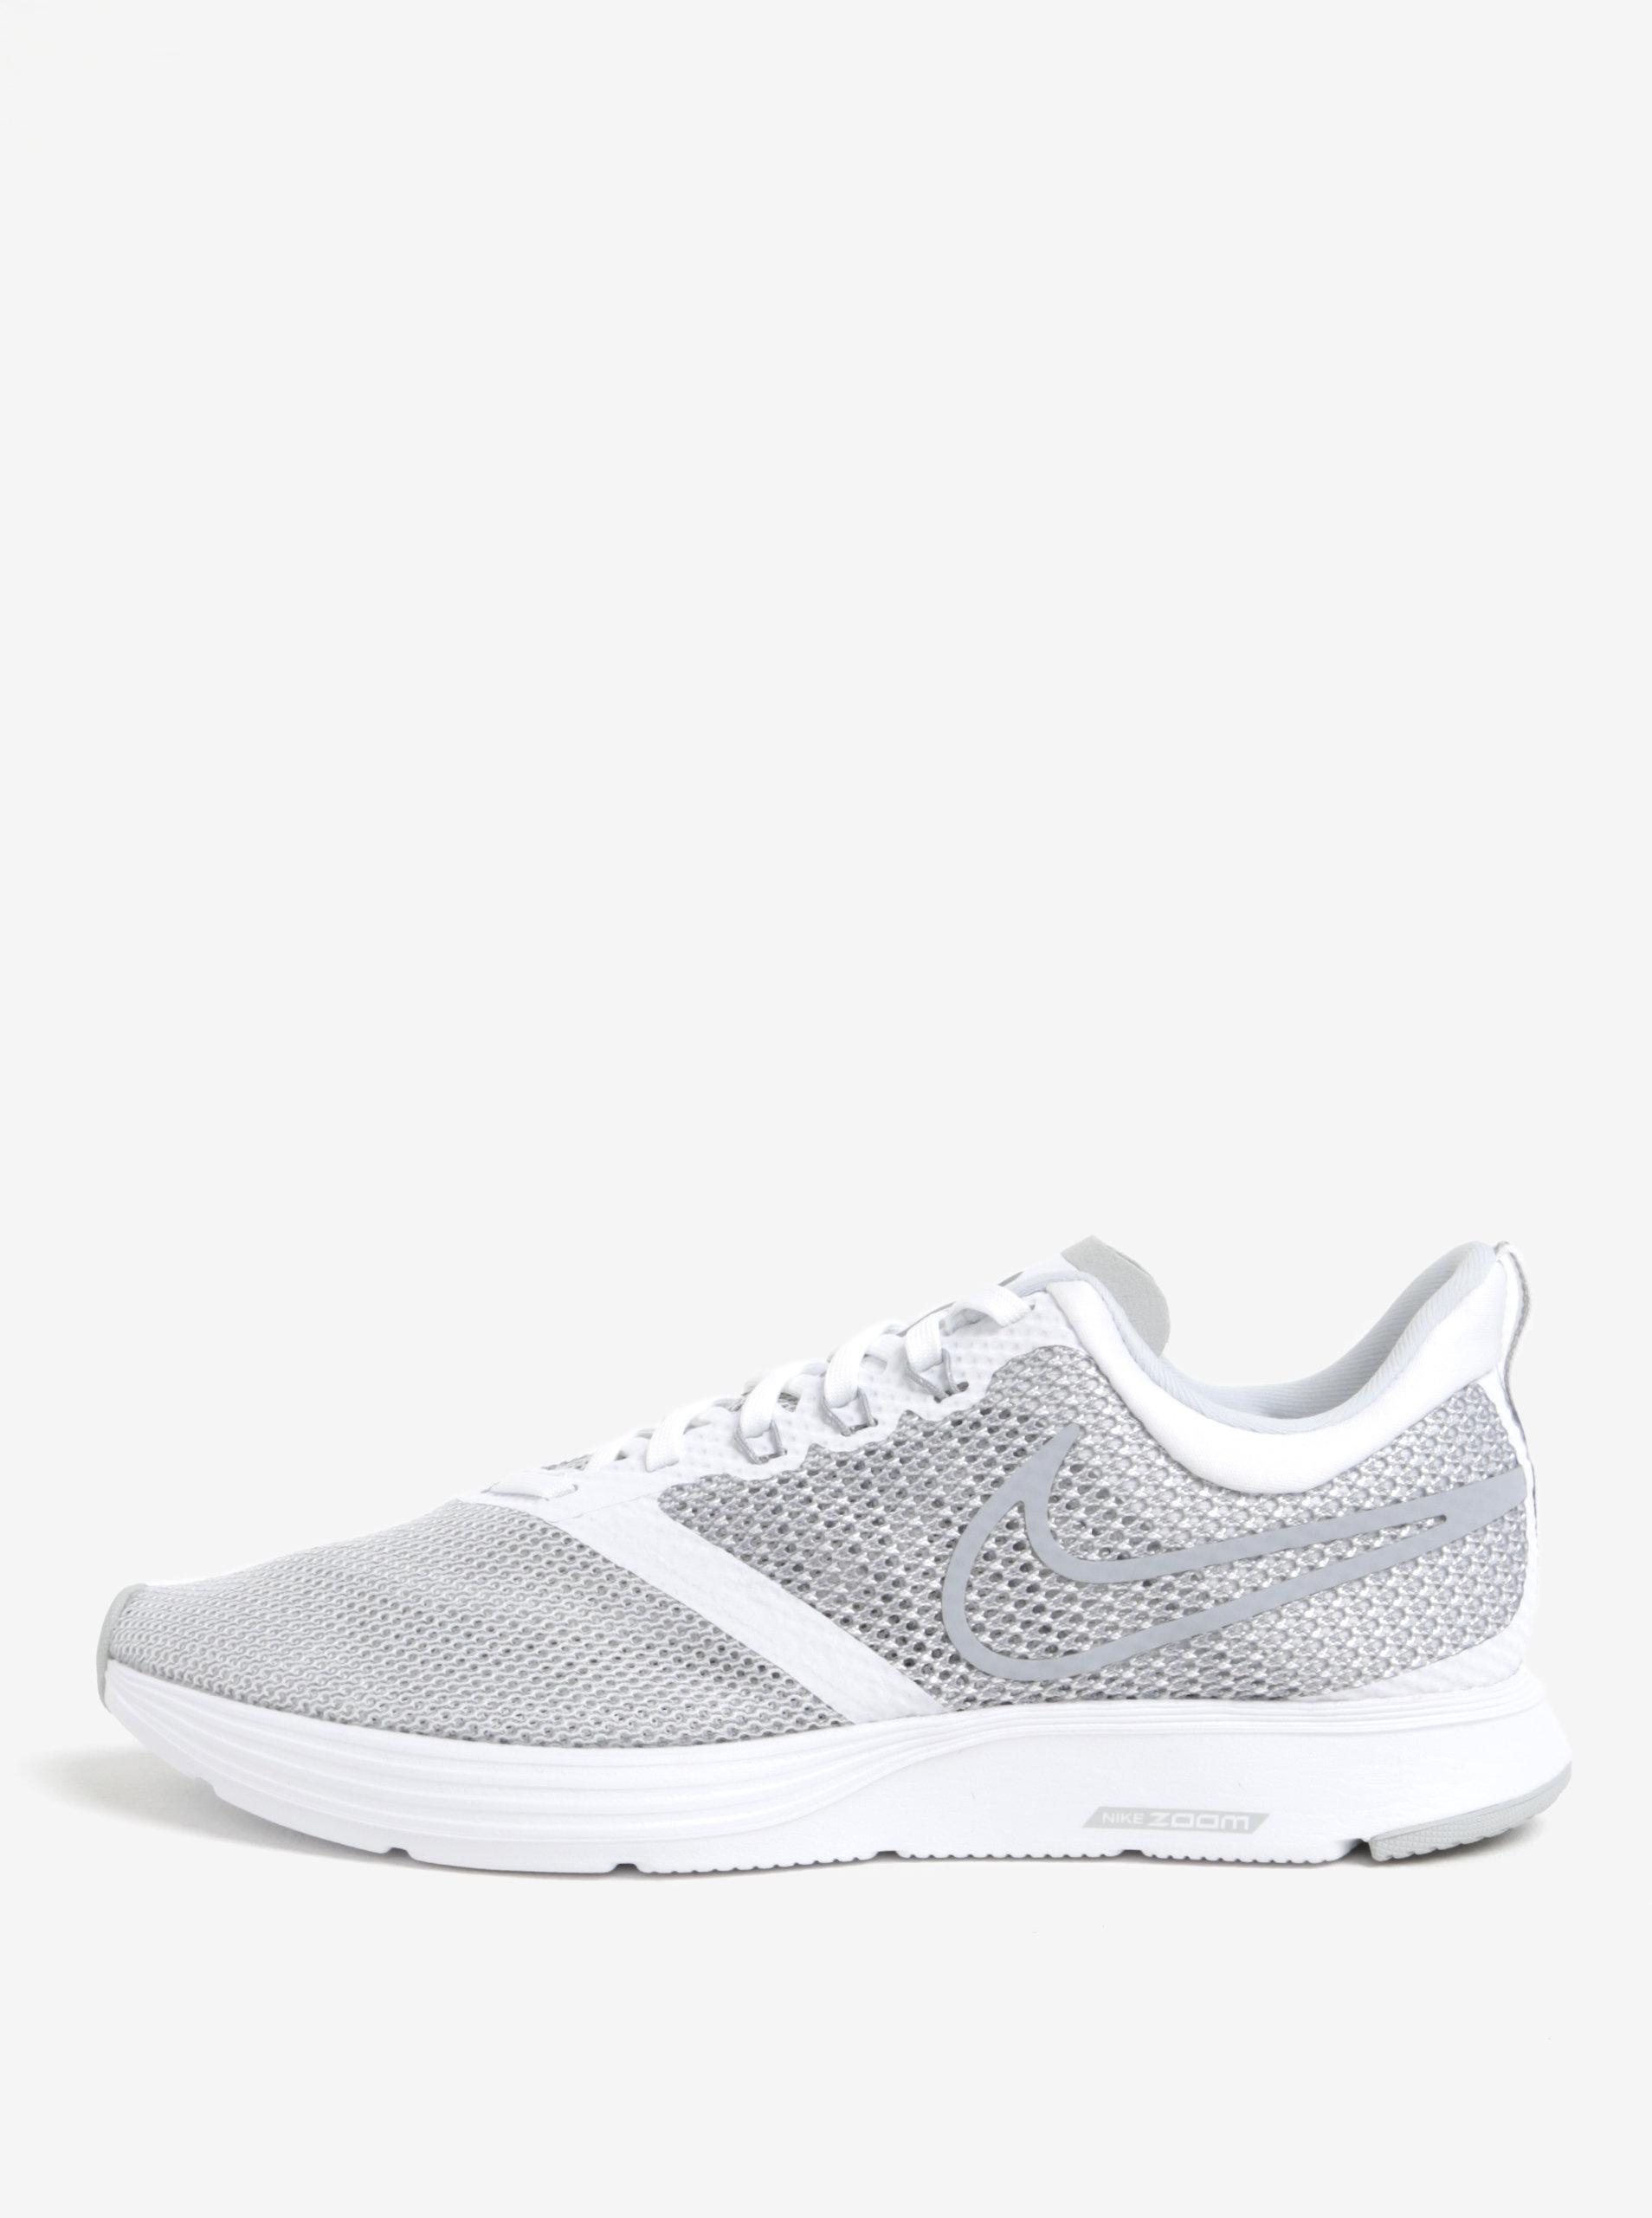 Sivo-biele pánske tenisky Nike Zoom Strike Running ... b9a8d048e99